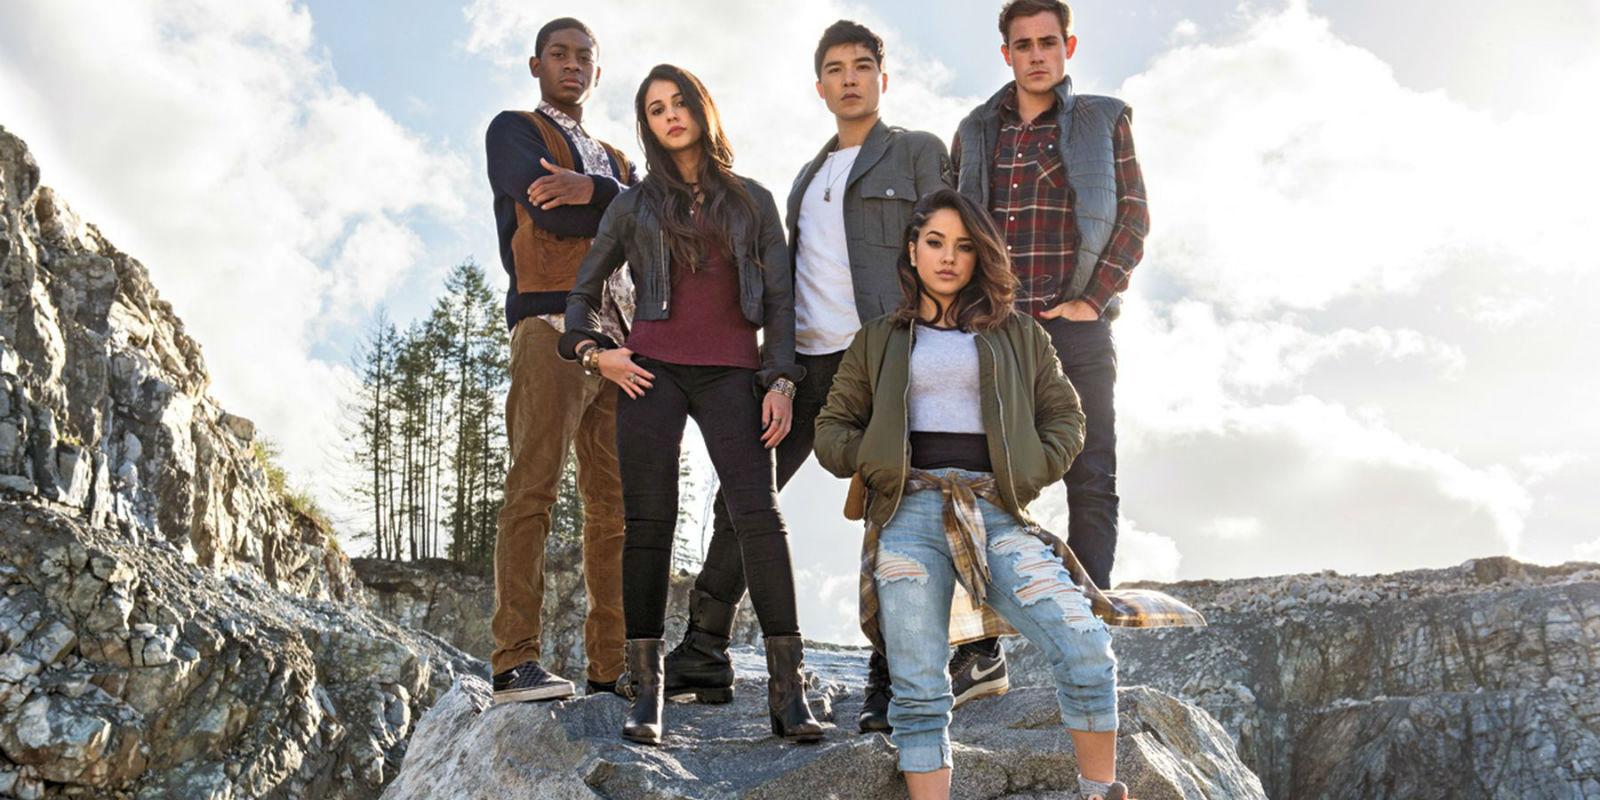 Power Rangers 2017 movie cast